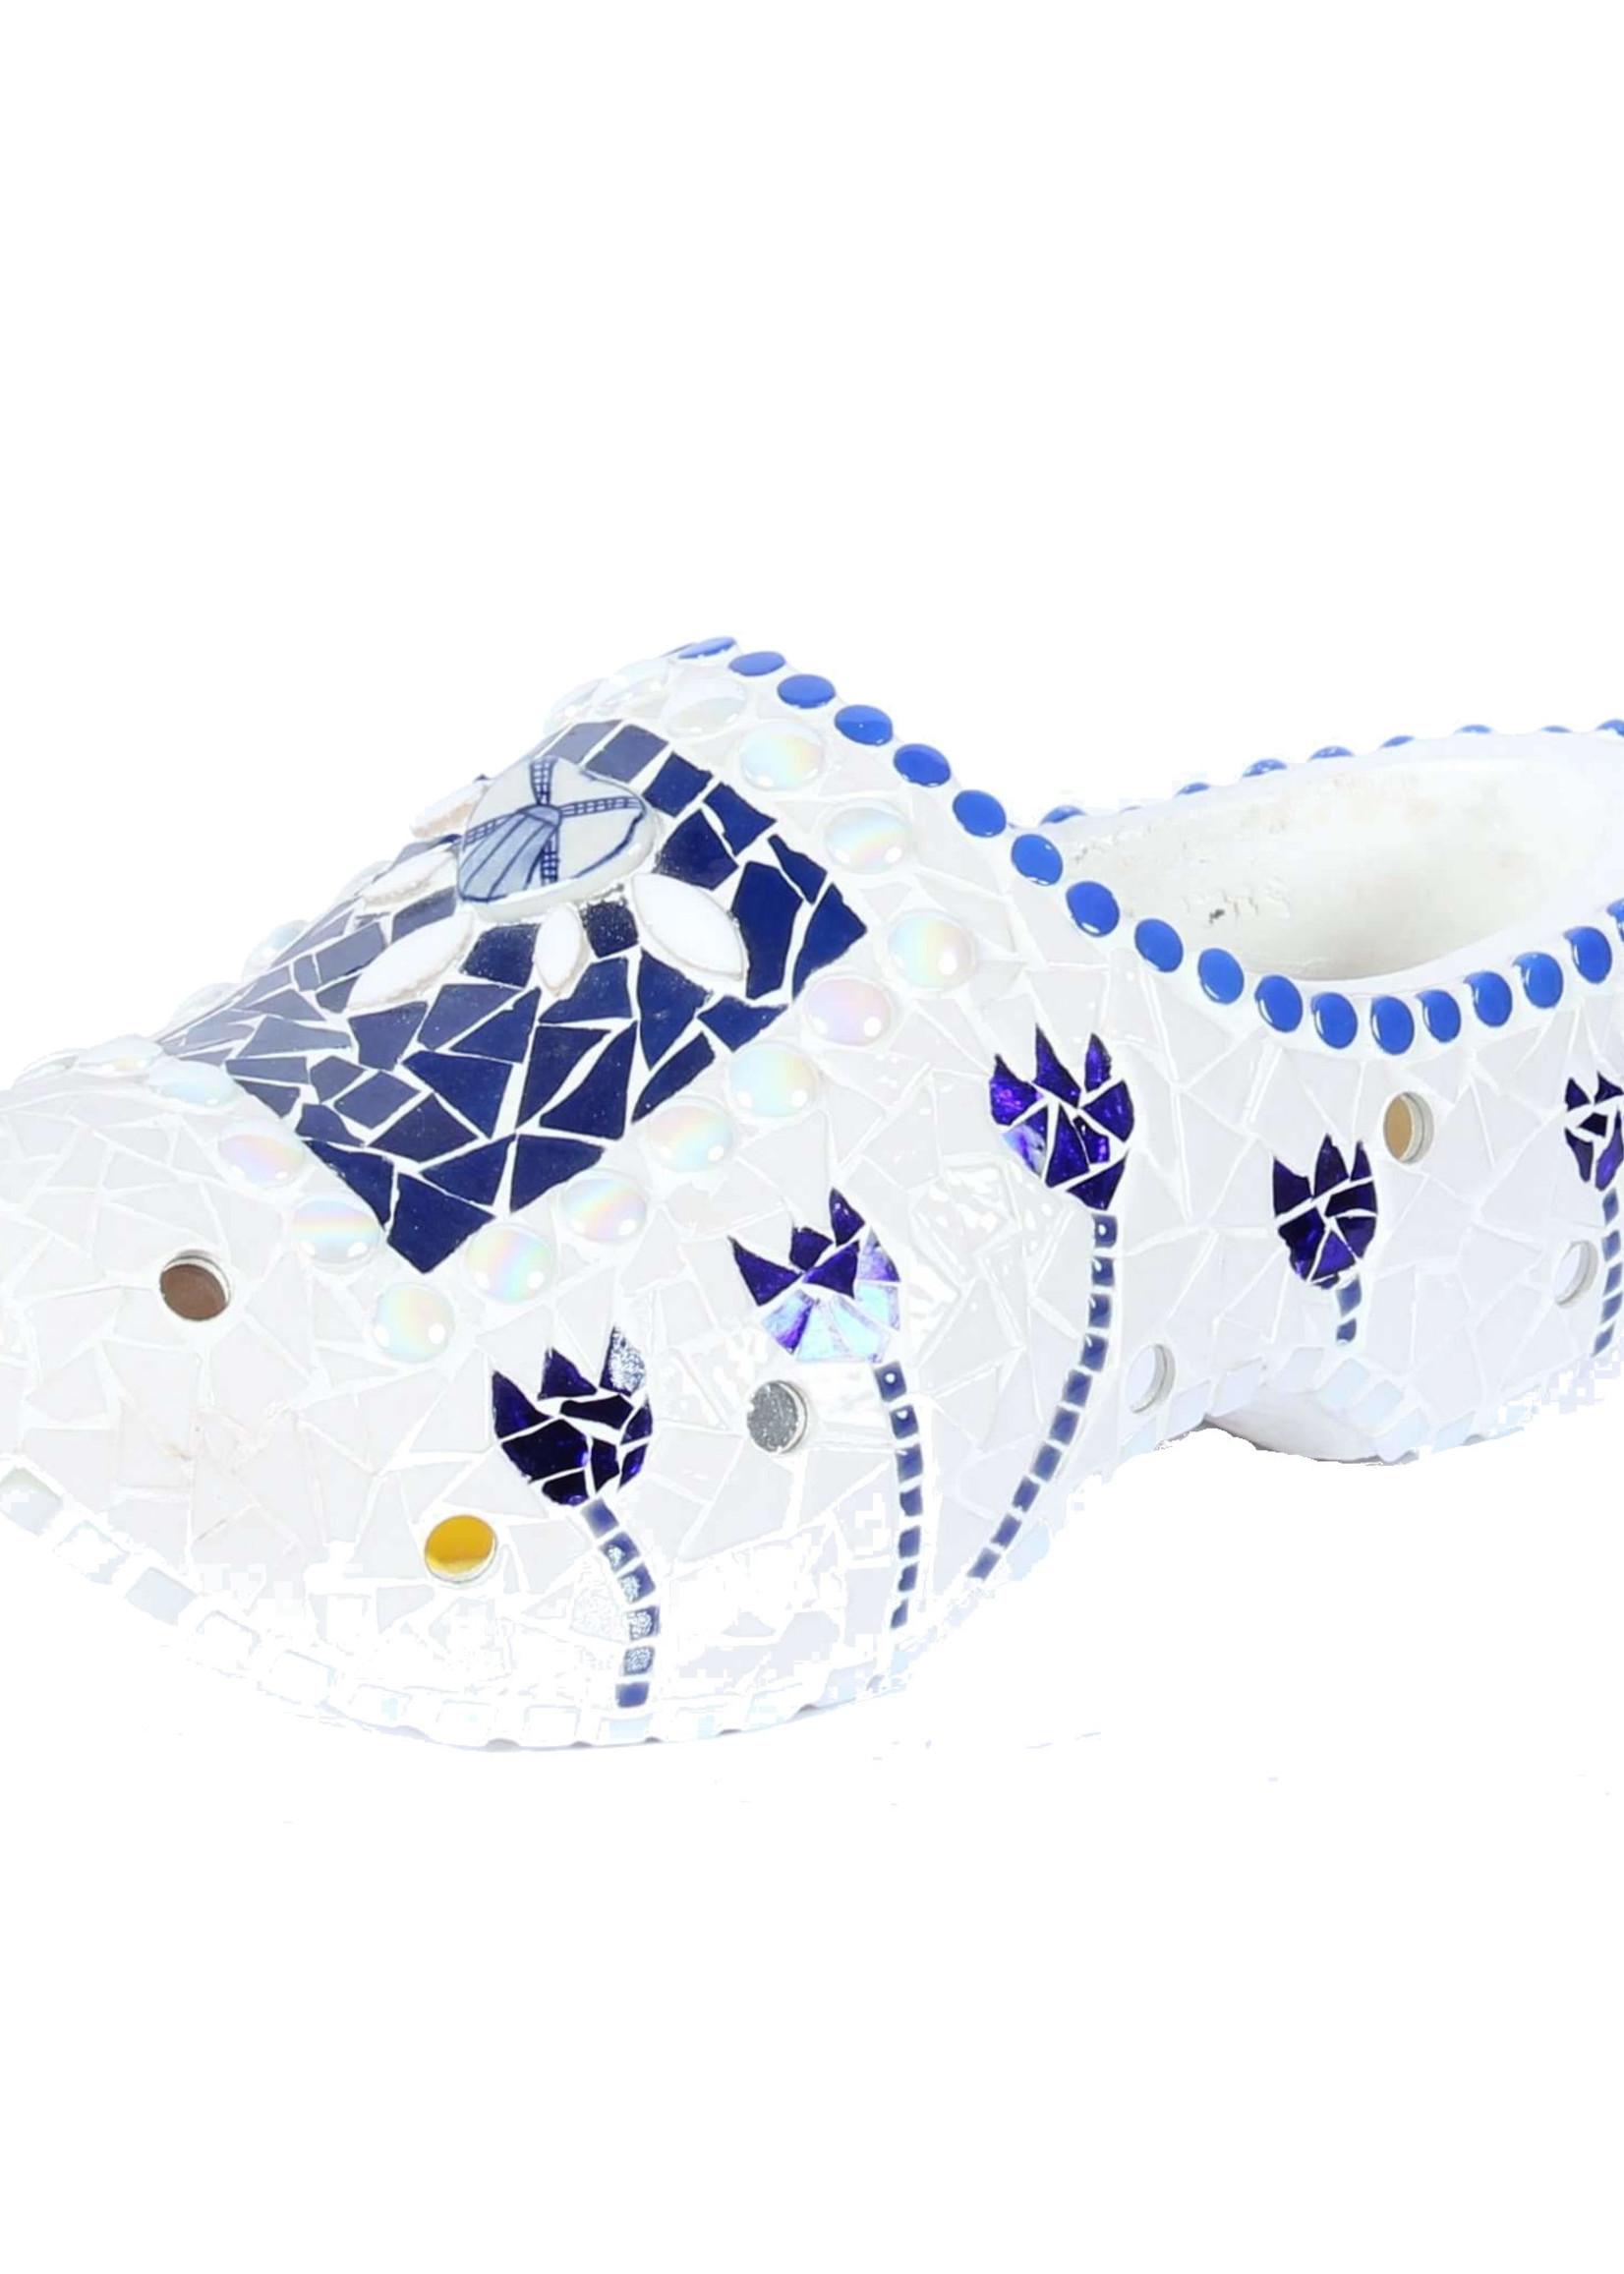 Blue White Mosaic Artist Clog, Hand made